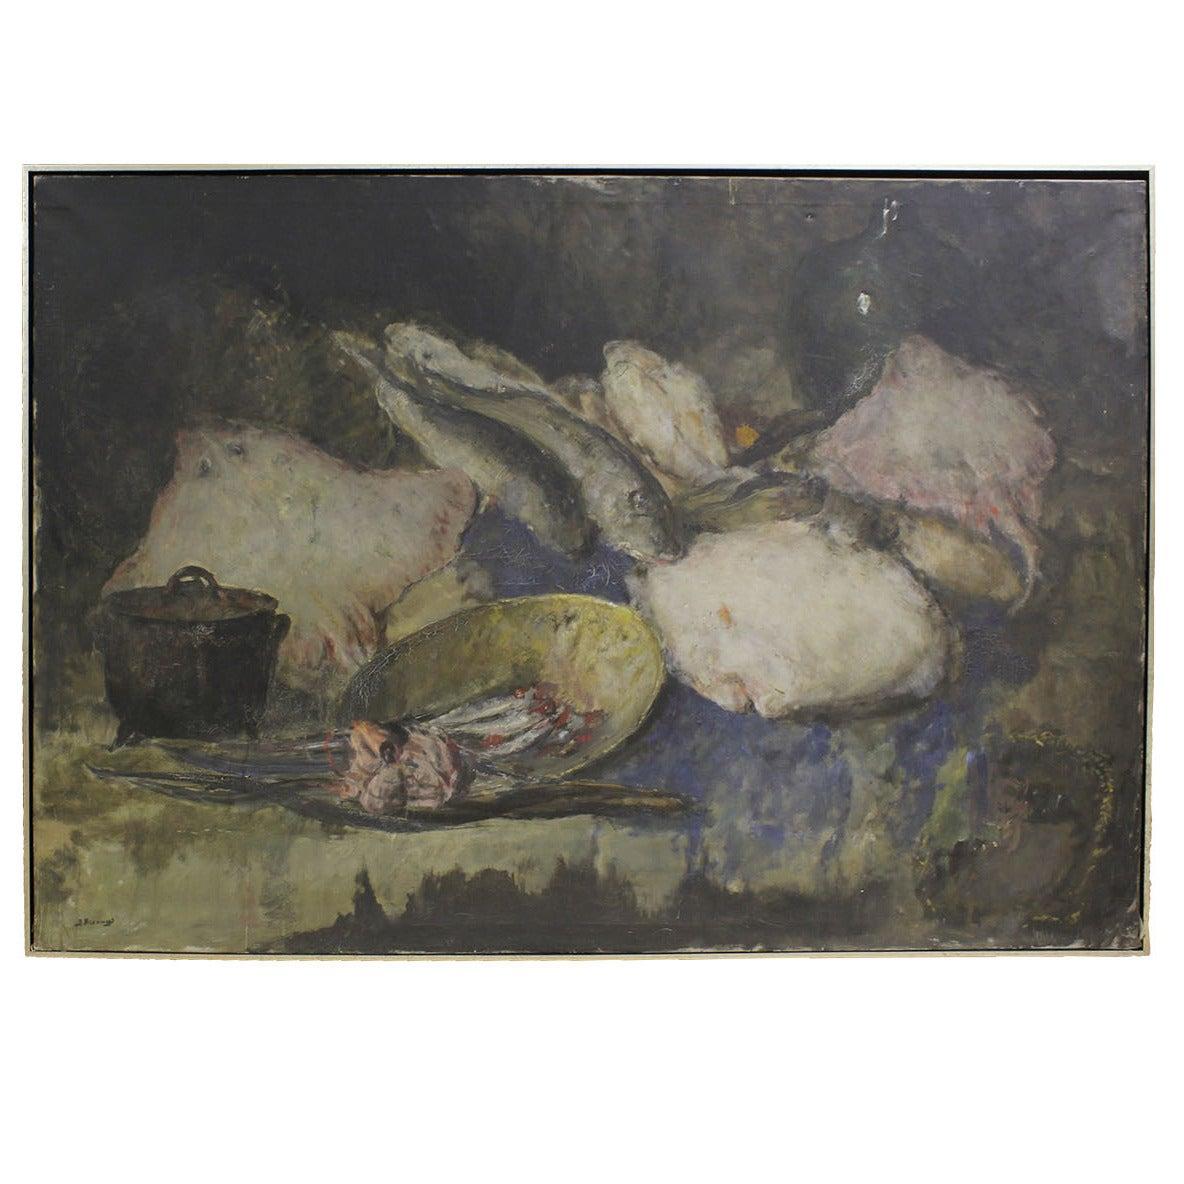 19c Belgian Still Life Painting by Jules Hubert Brouwers